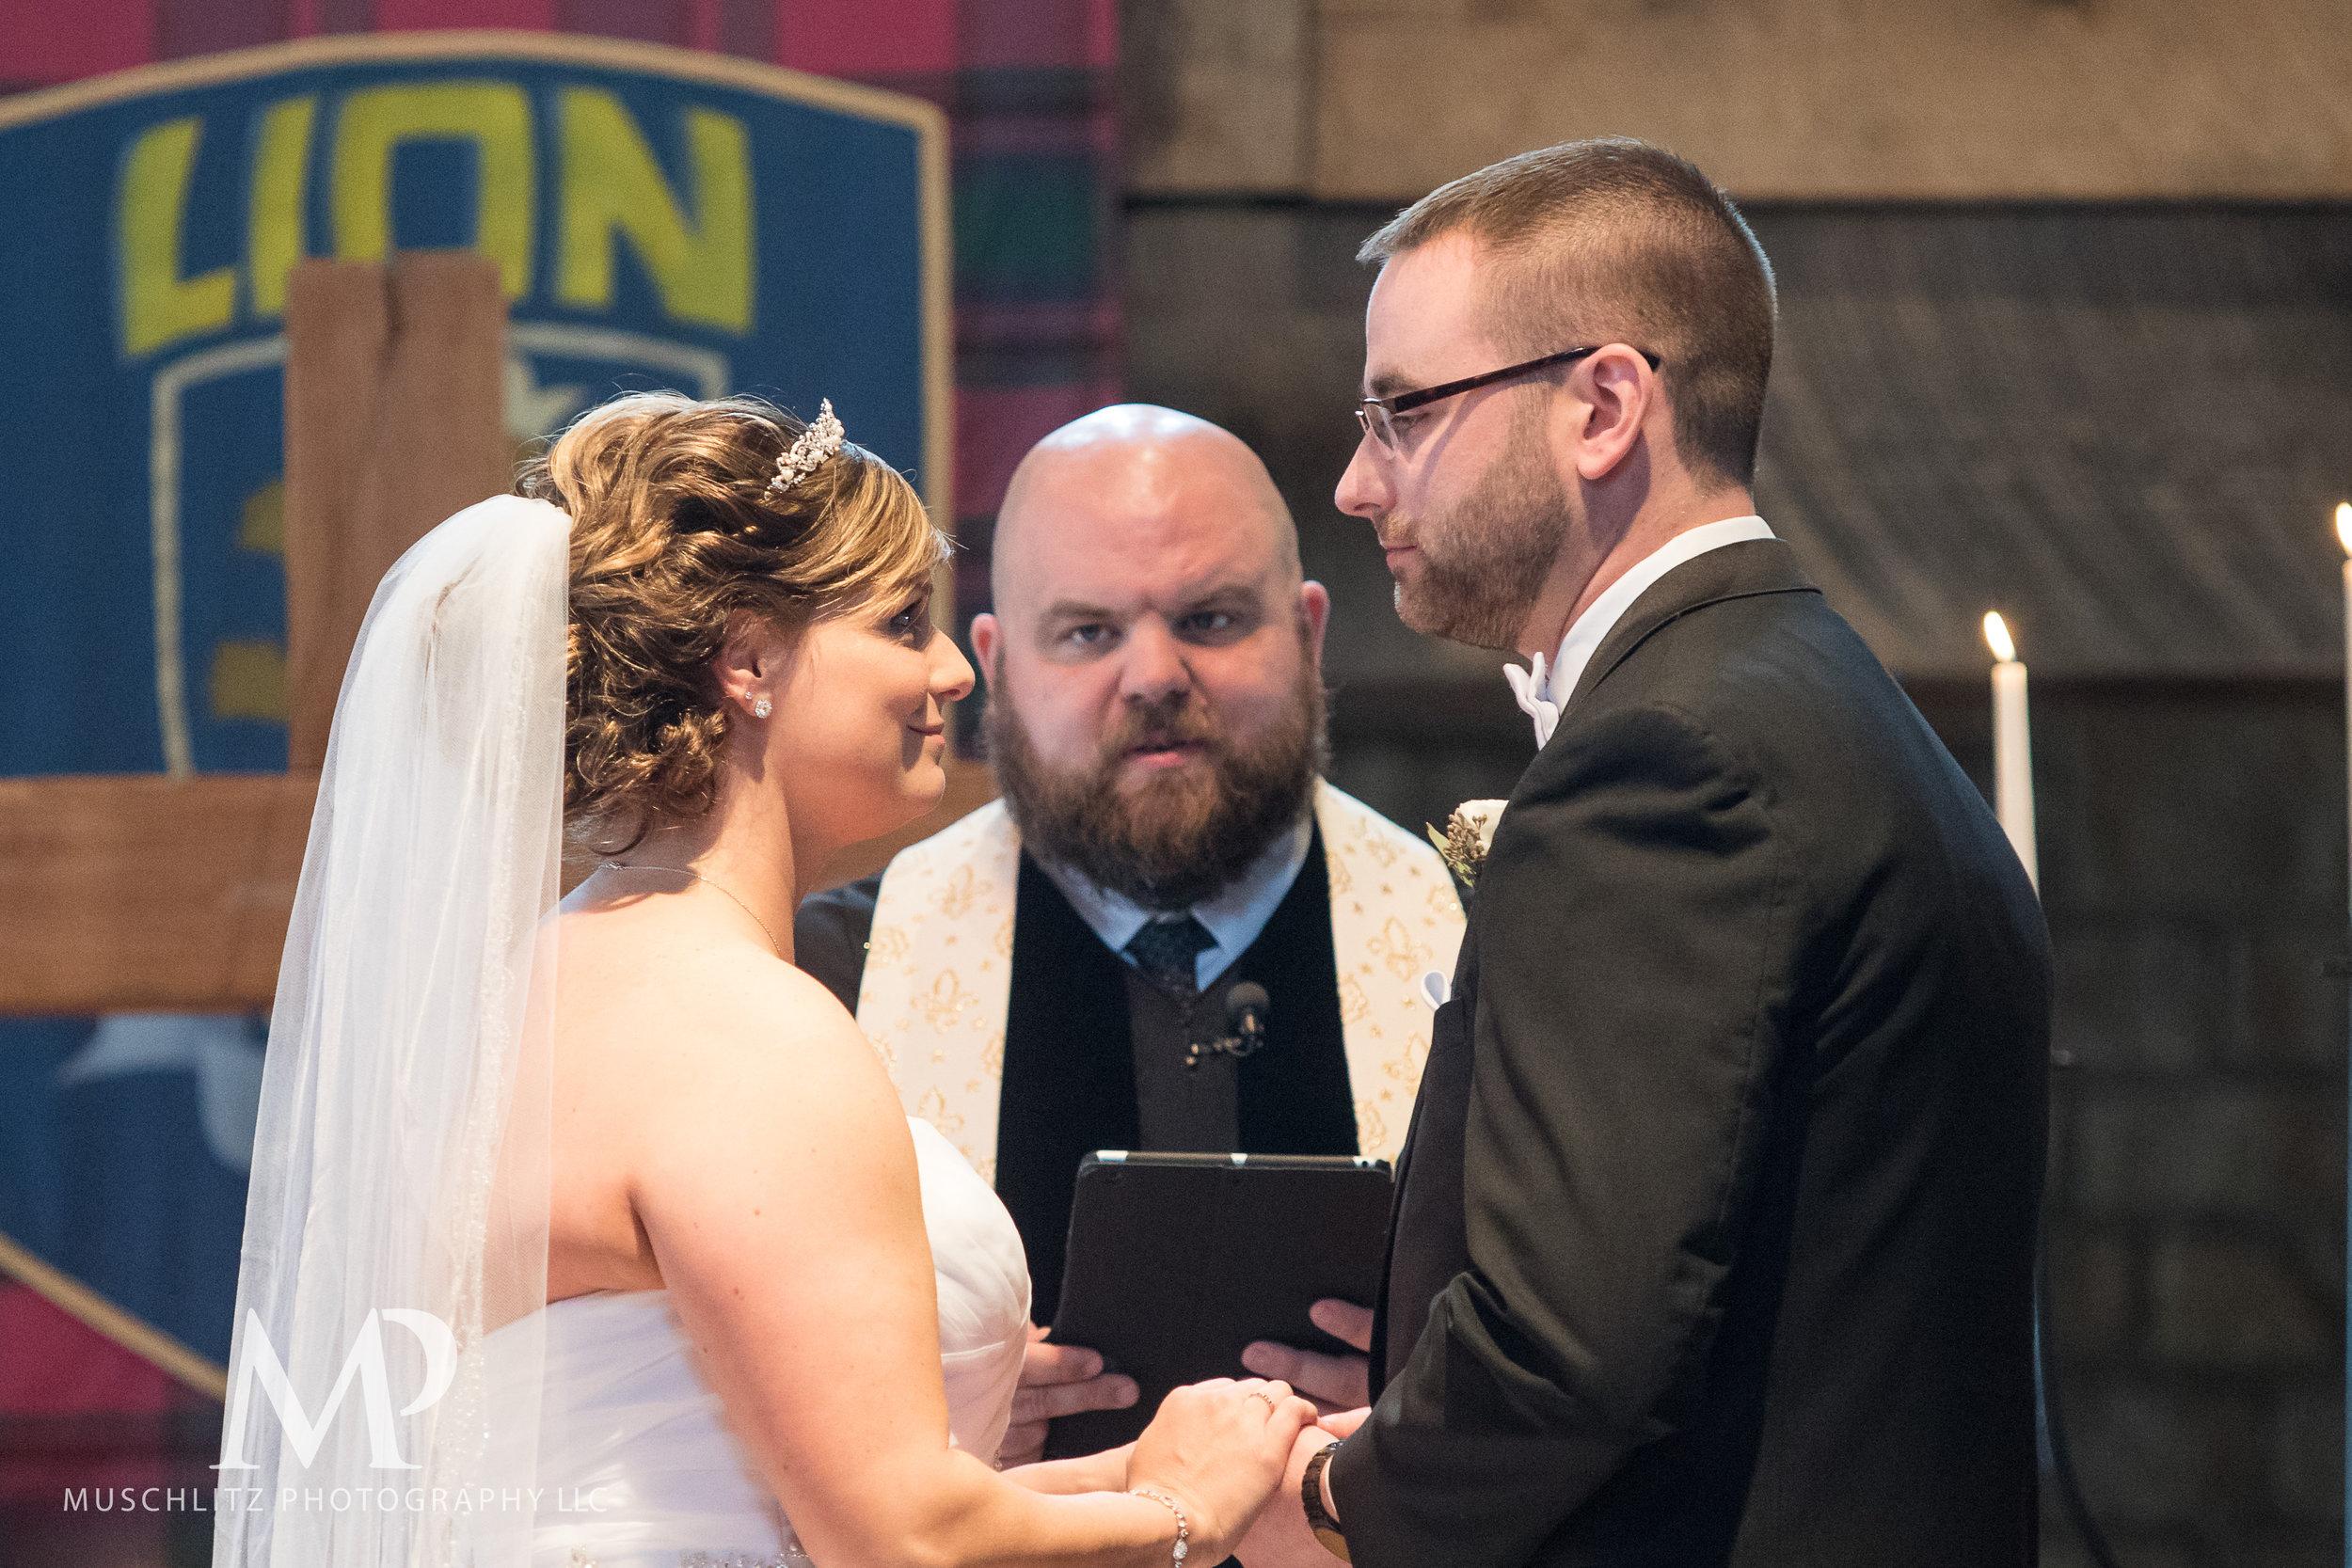 liberty-barn-presbyterian-church-wedding-delaware-columbus-ohio-muschlitz-photography-039.JPG